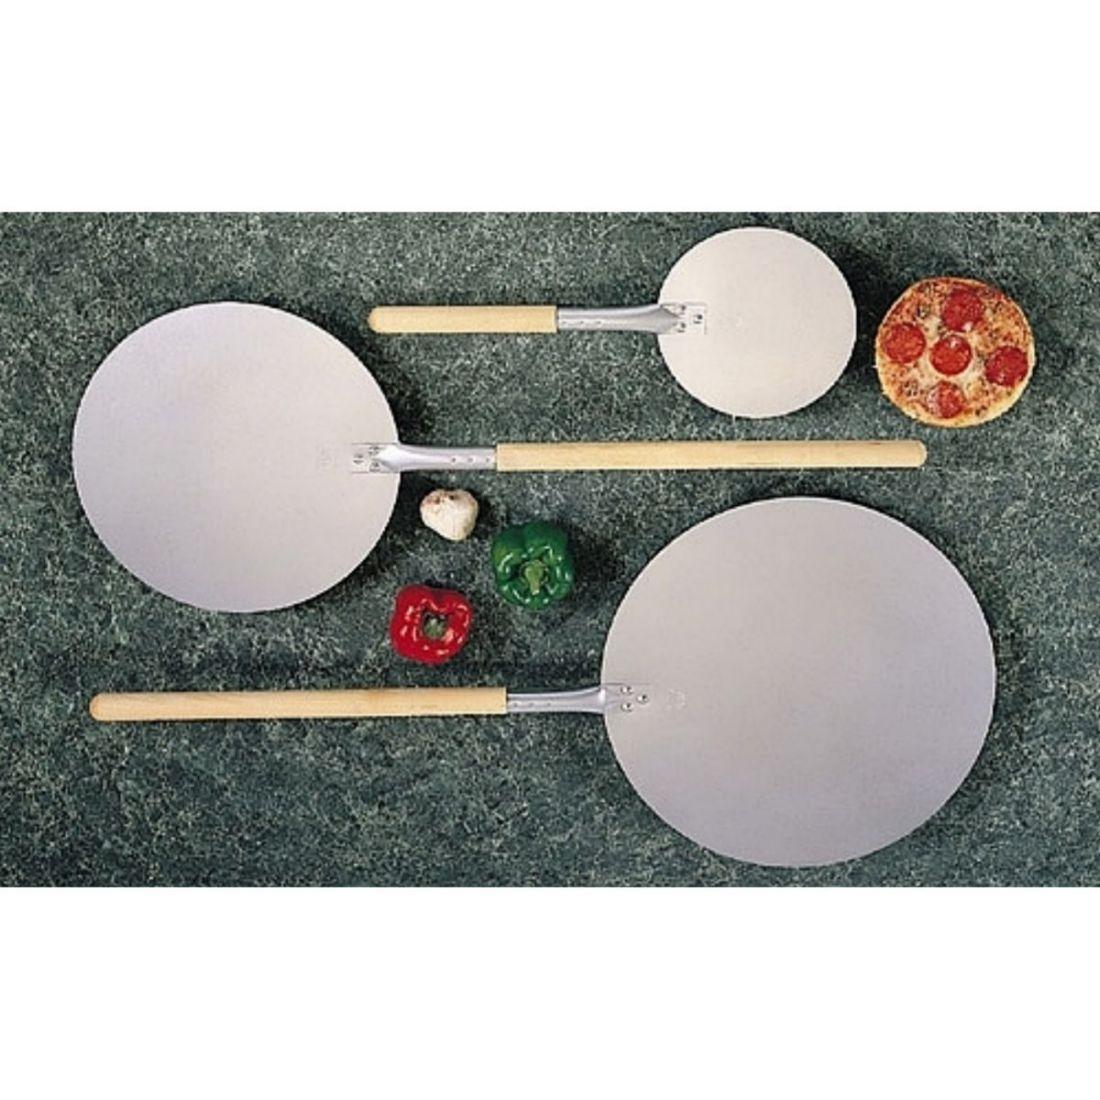 Lopata na pizzu kulatá 340 mm, dl. 890 mm